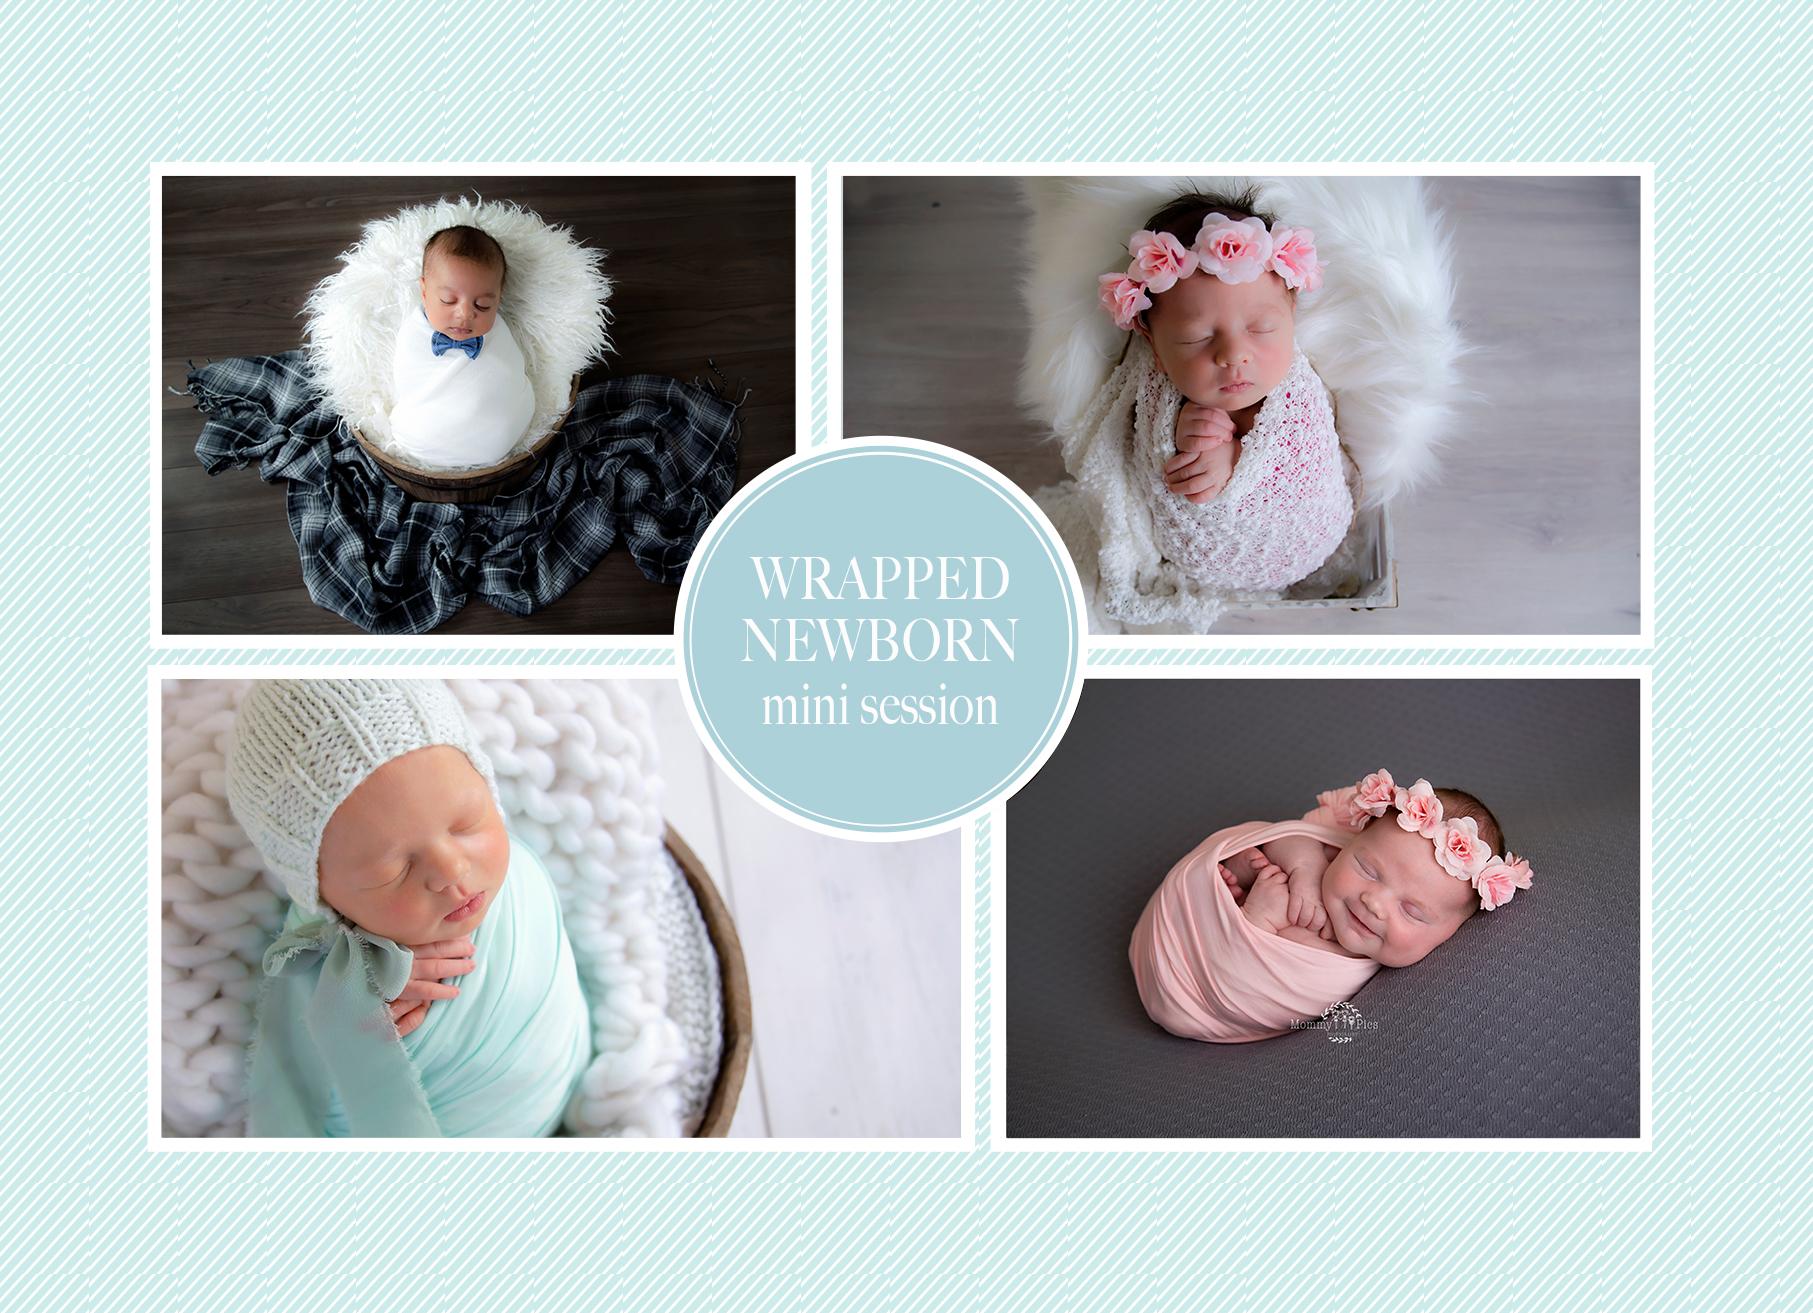 minis newborn 2 copy